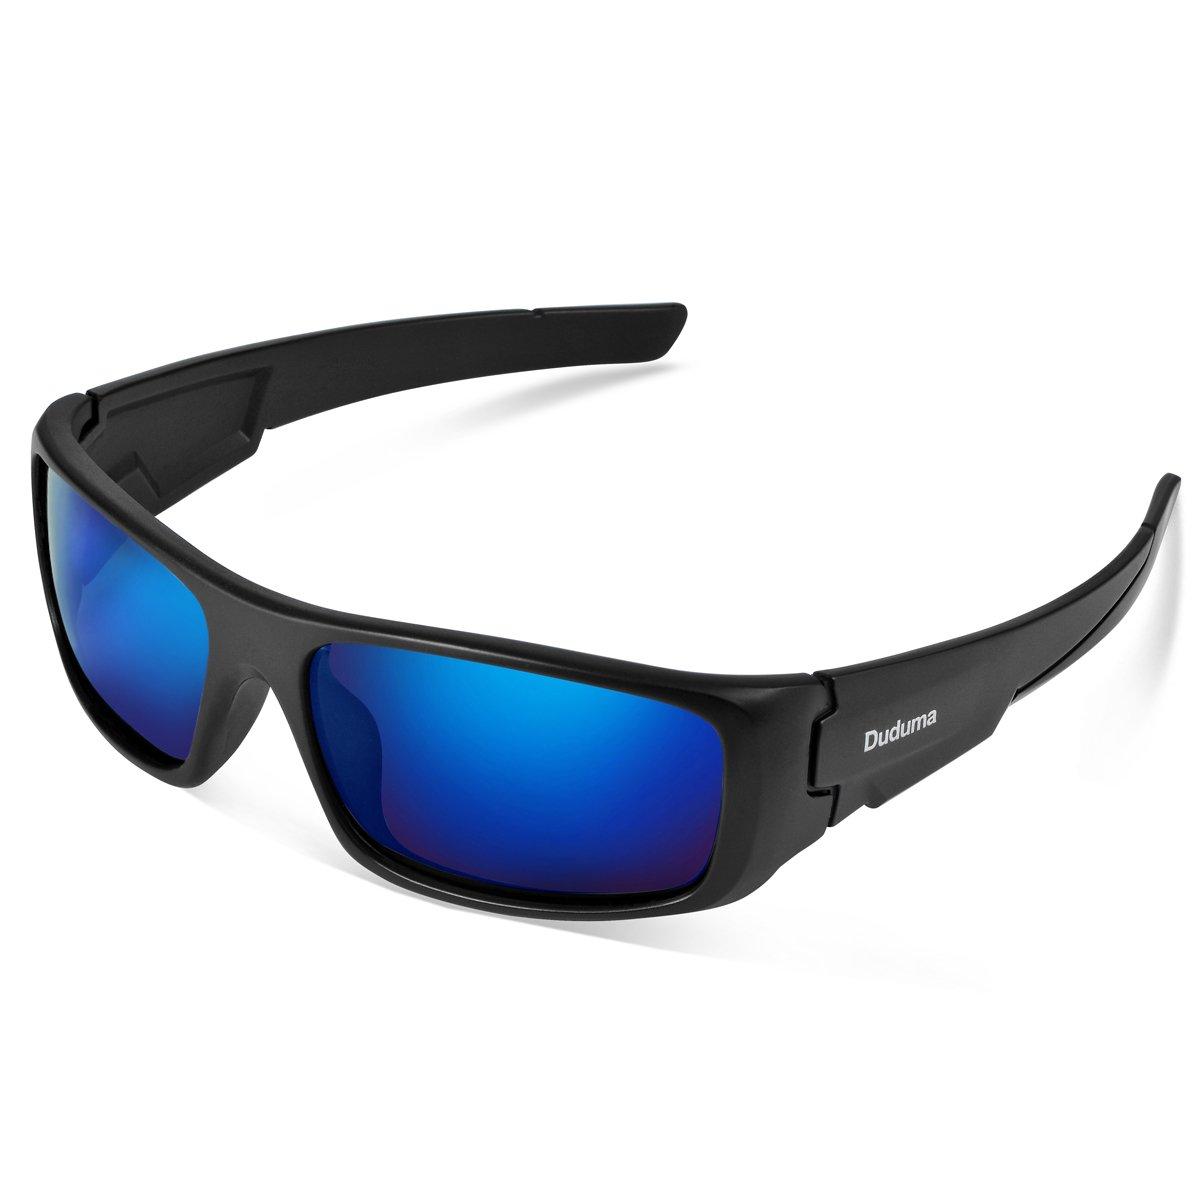 49f0bec72e Amazon.com  Duduma TR601 Polarized Sports Sunglasses for Men Women Baseball  Running Cycling Fishing Driving Golf Softball Hiking Superlight Frame   Sports   ...